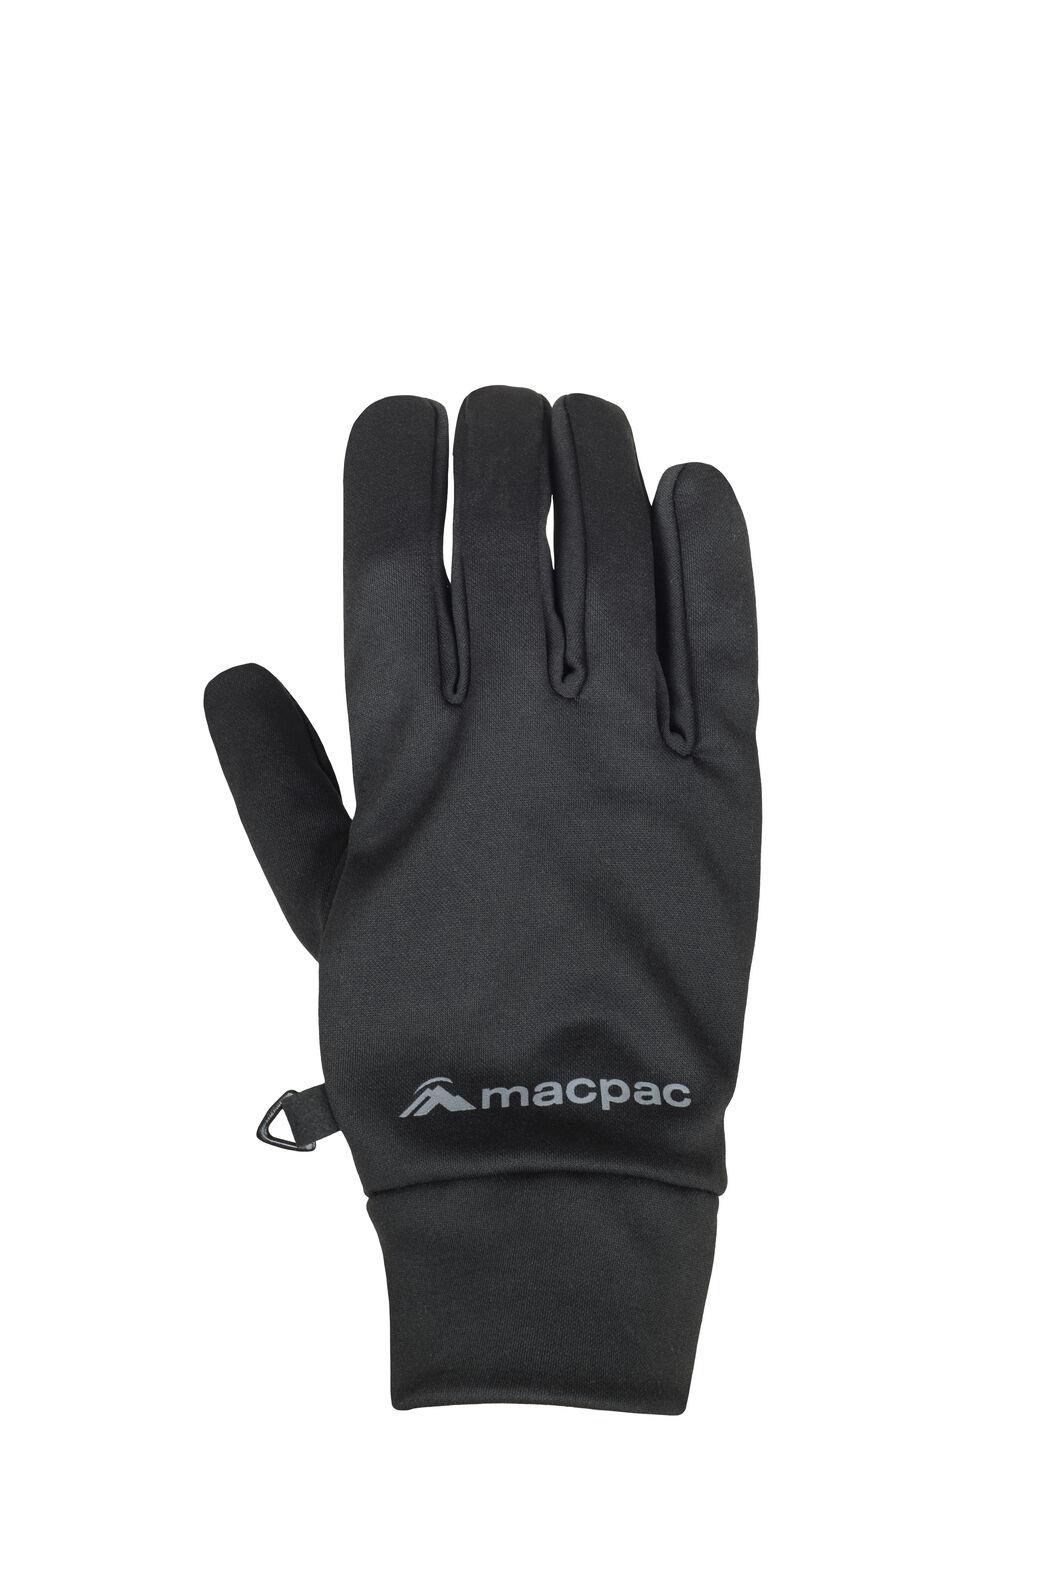 Macpac Stretch Gloves V2, Black, hi-res